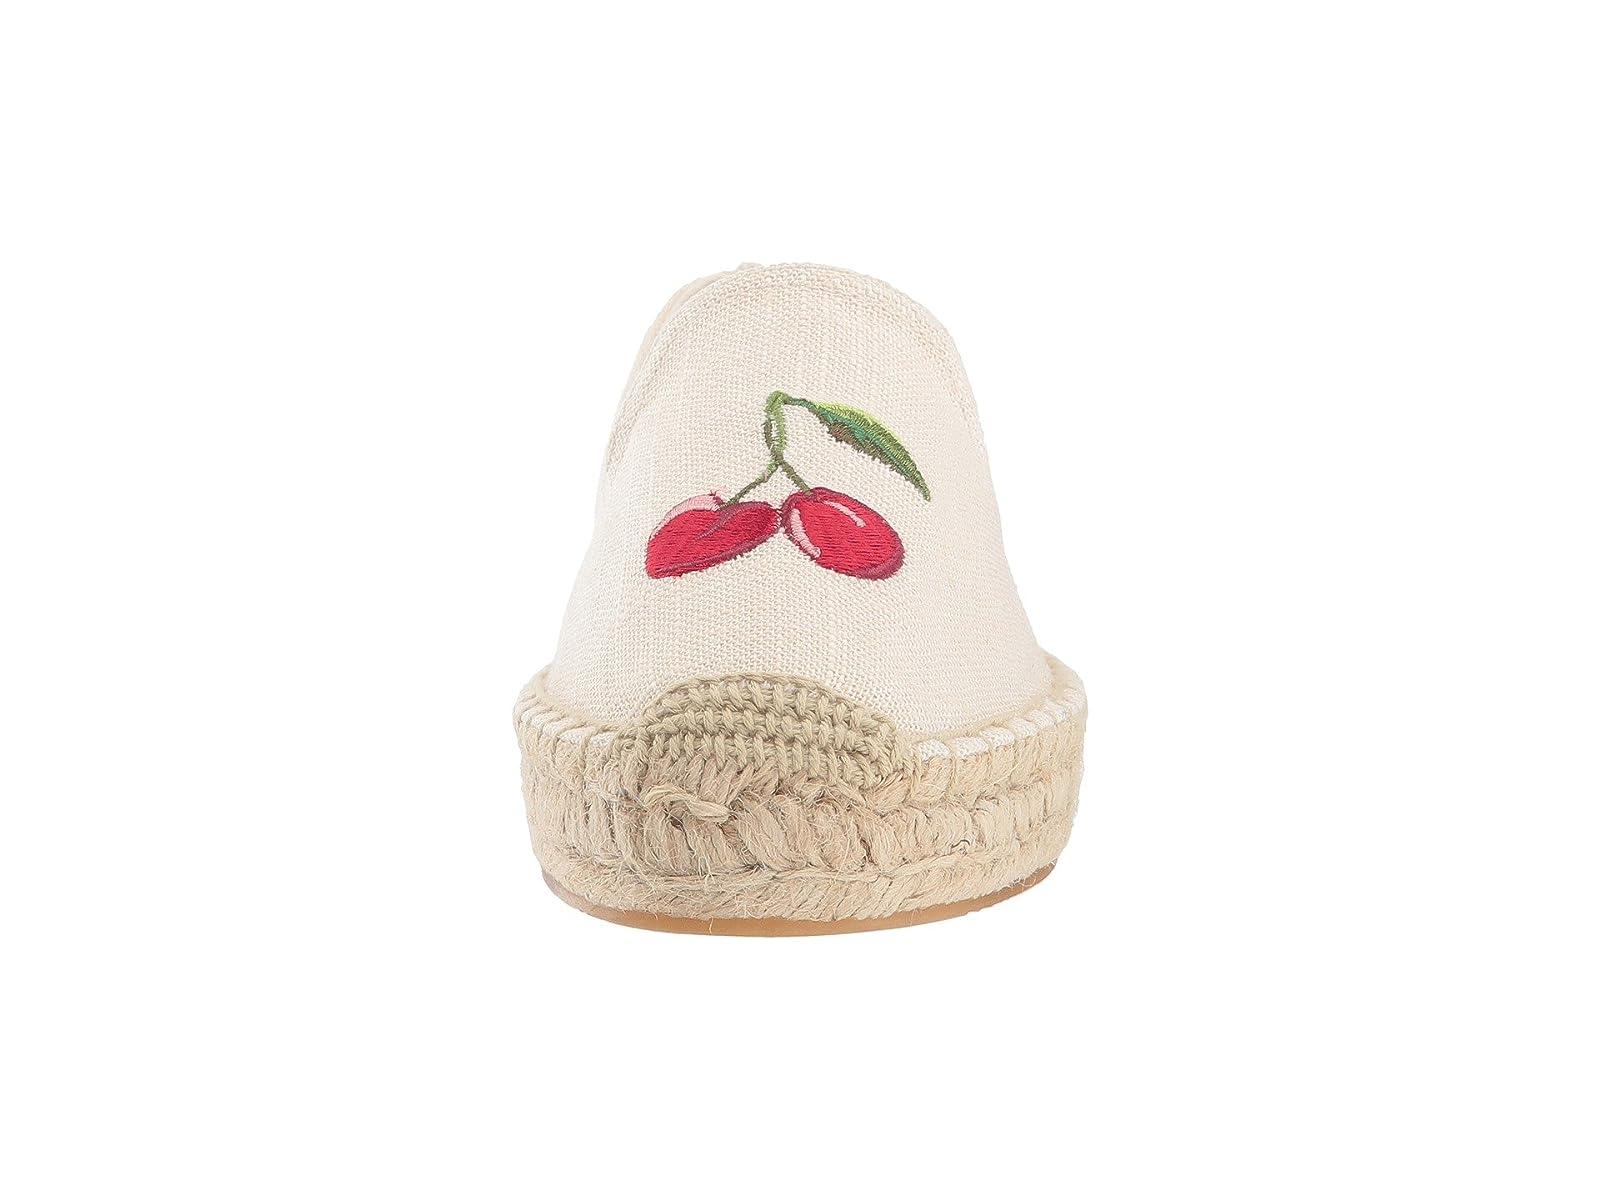 Soludos Soludos Soludos Cherries Smoking Slipper 92a211